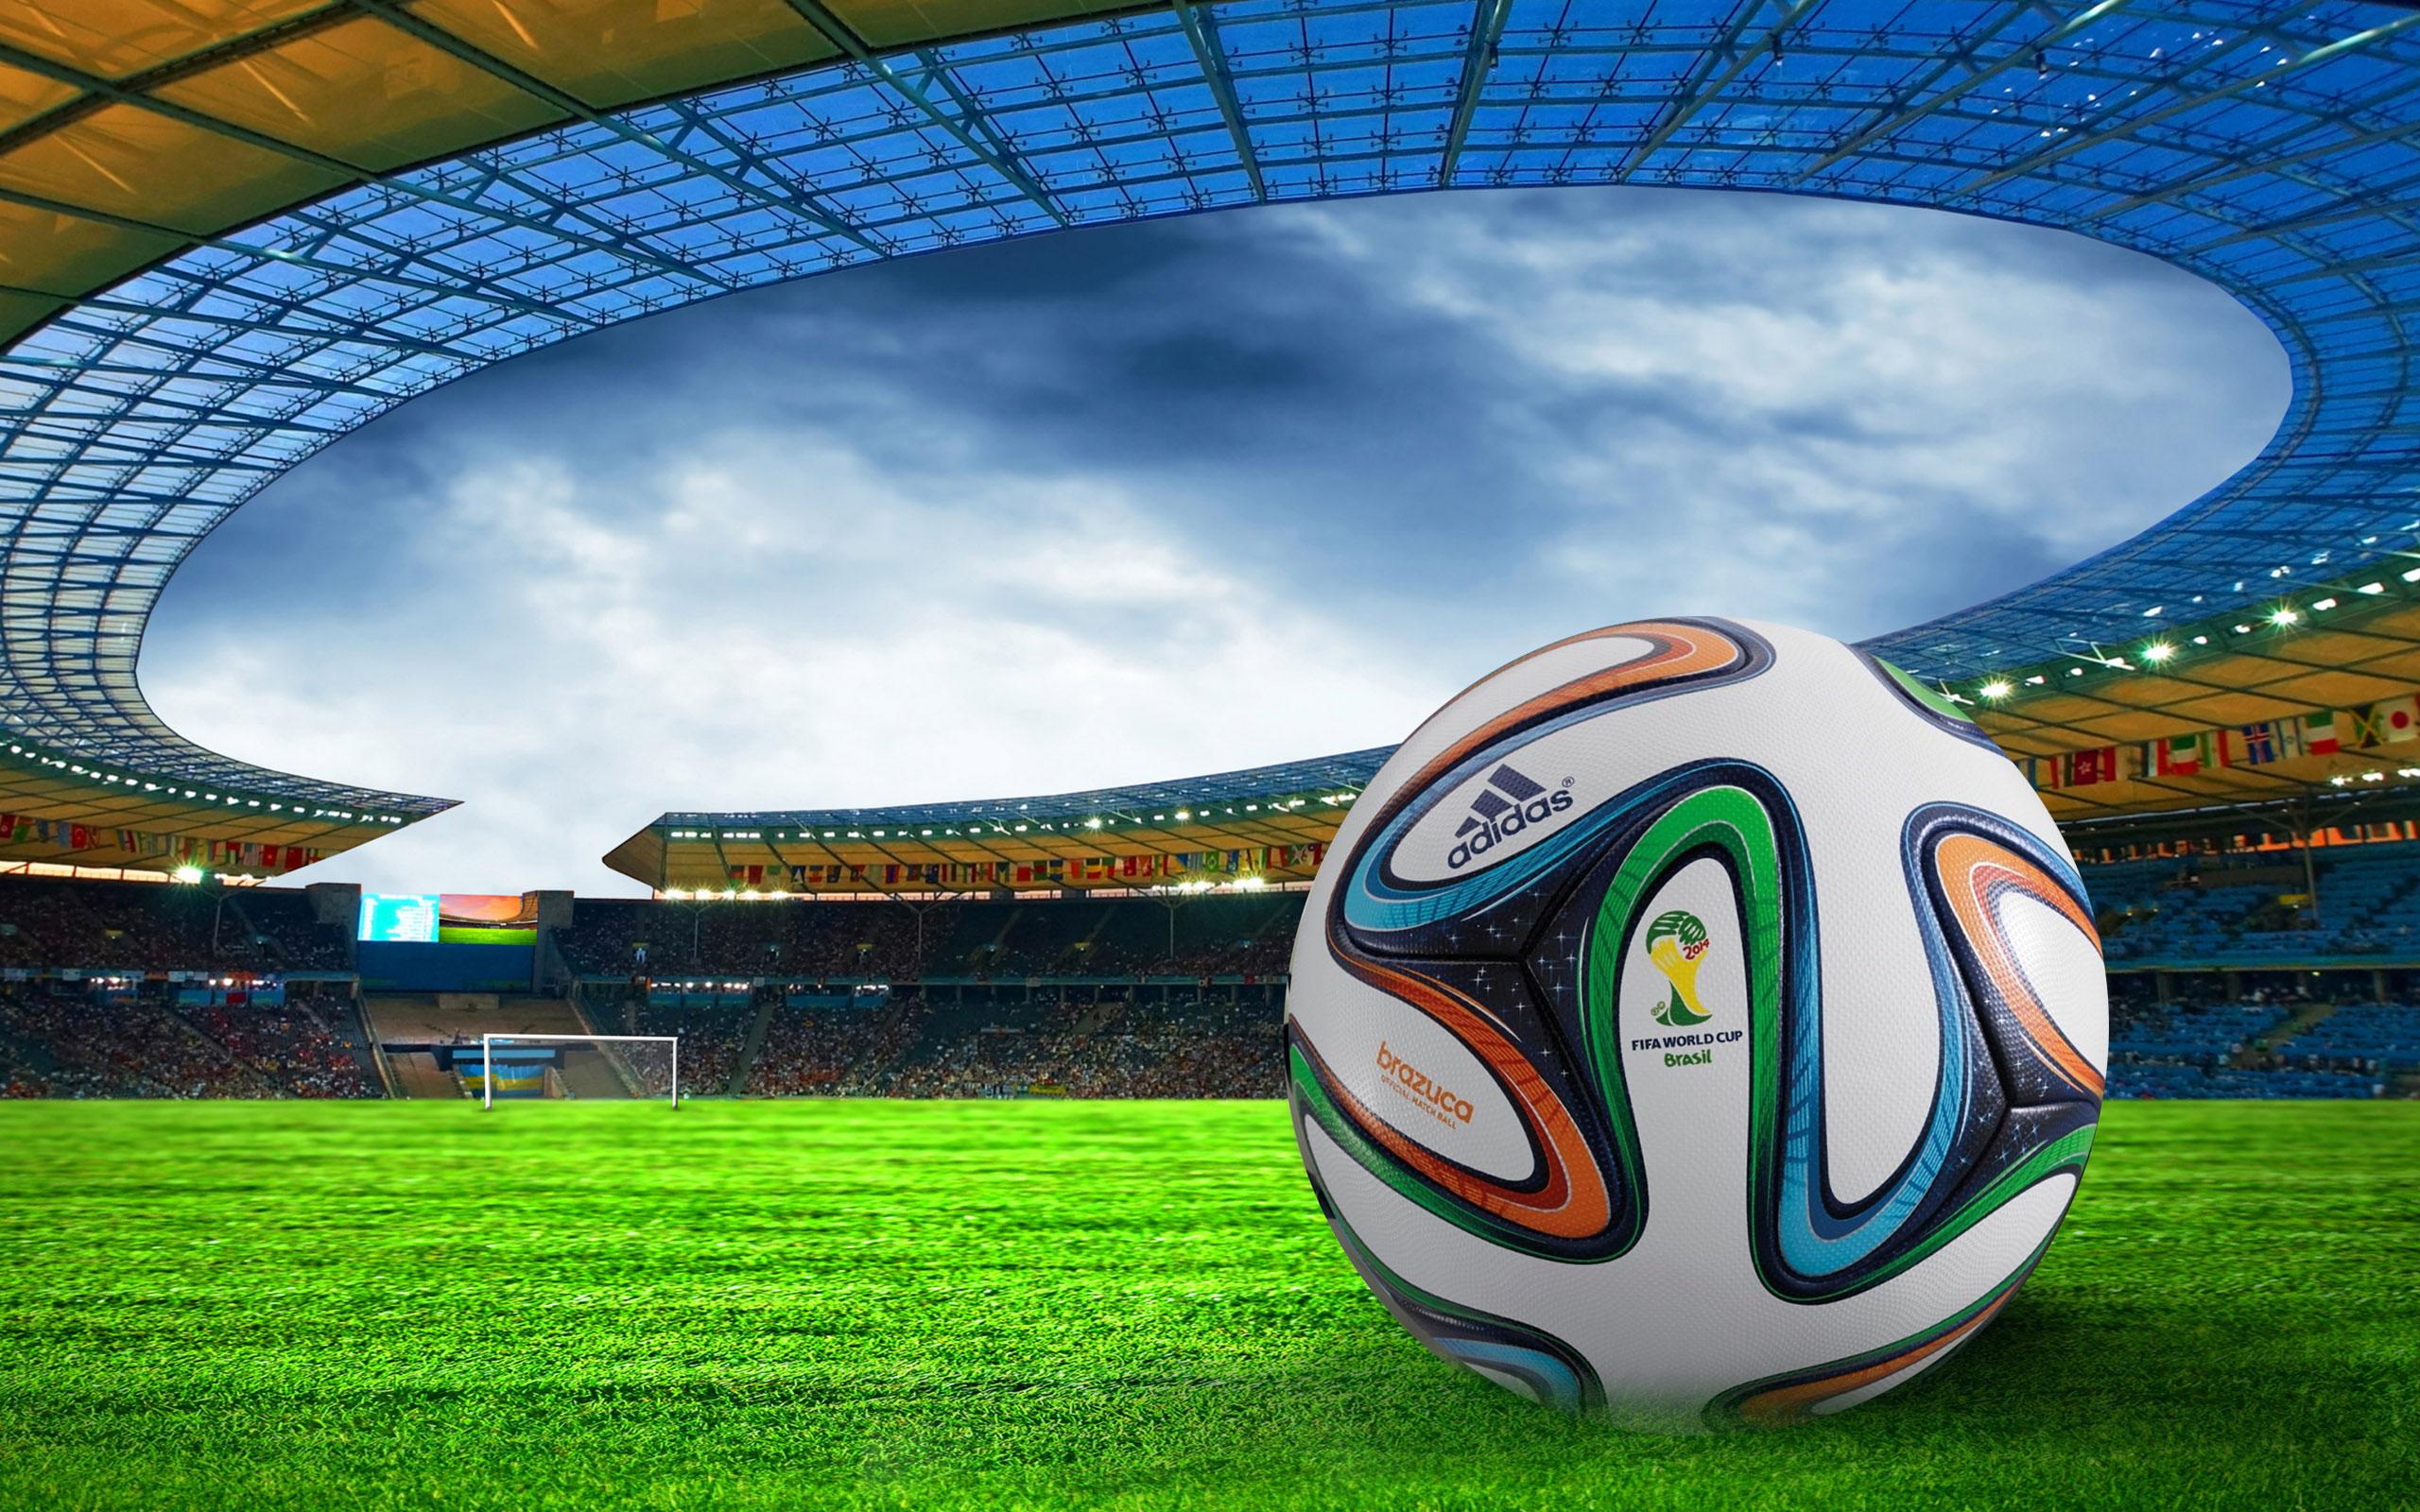 rabstol_net_world_cup_2014_01